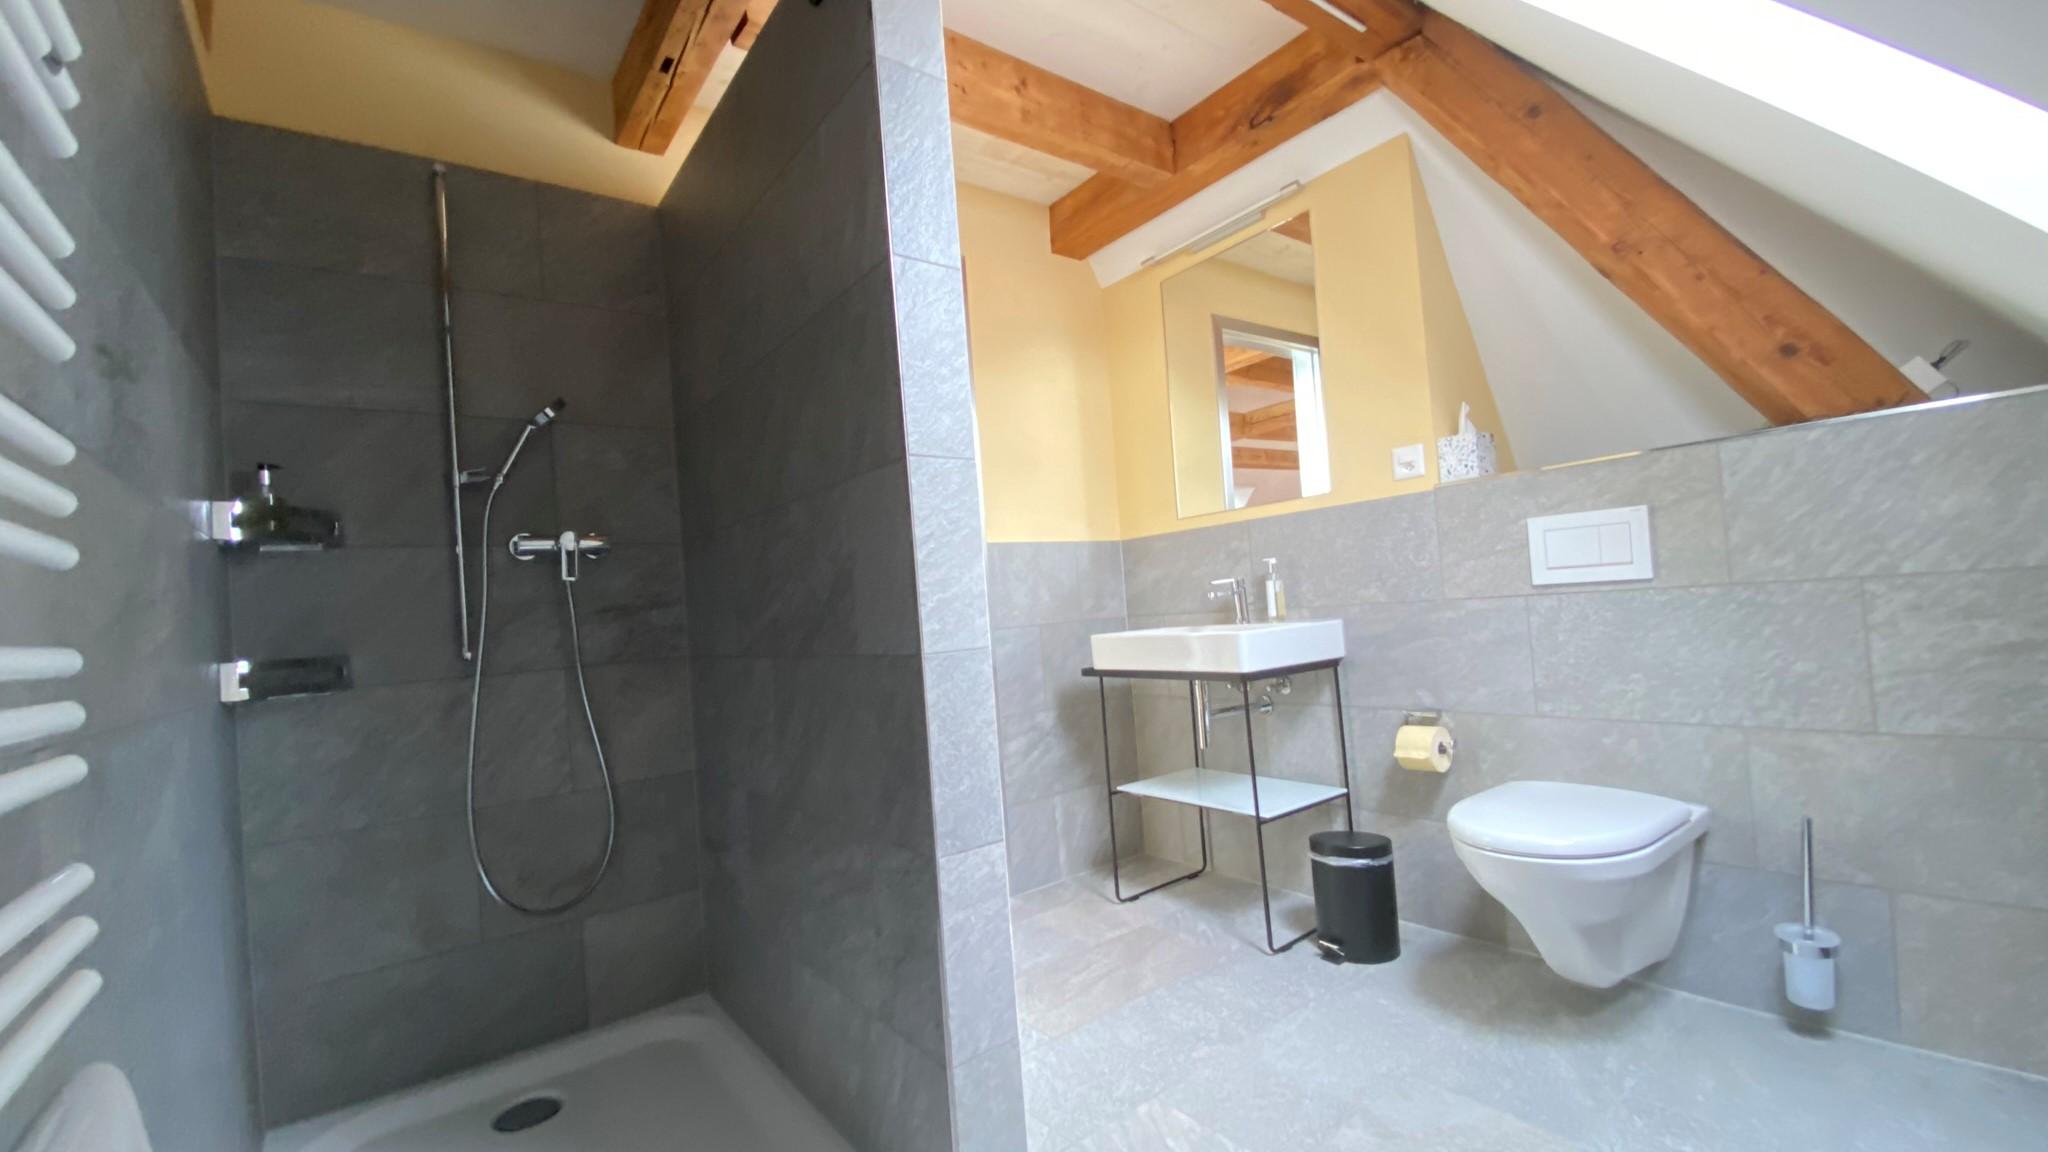 Loft Bad Dusche